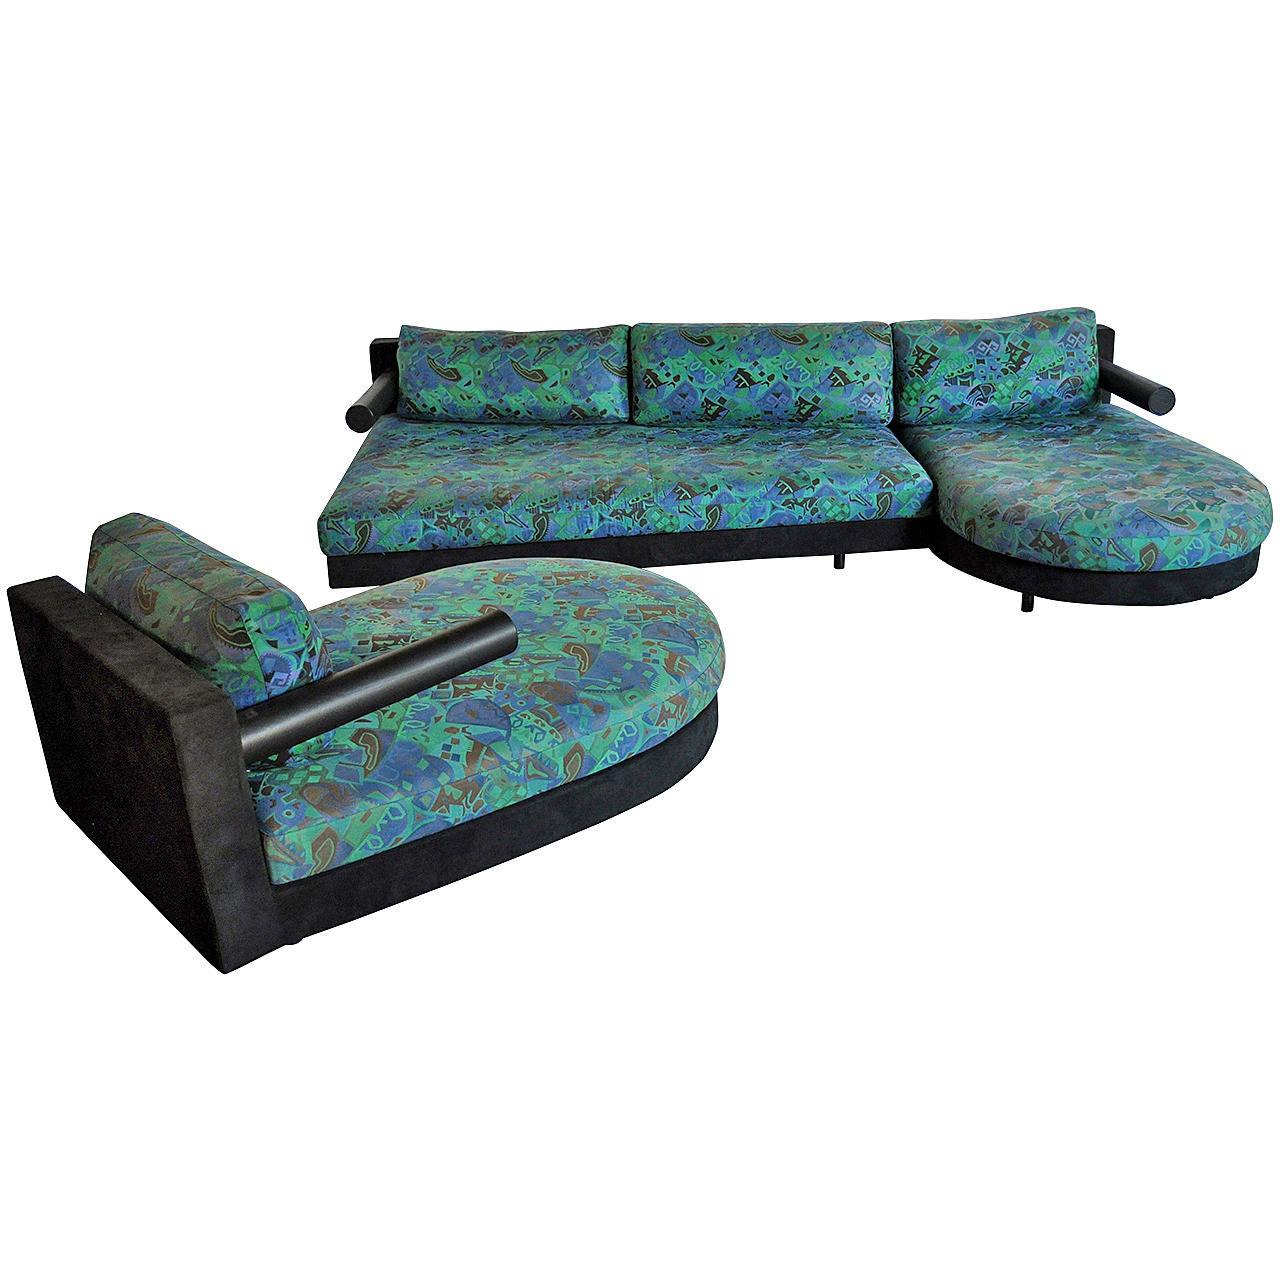 B B Italia Sity Modular Sectional Sofa And Chaise Lounge Set By Antonio Citterio Modular Sectional Sofa B B Italia Antonio Citterio